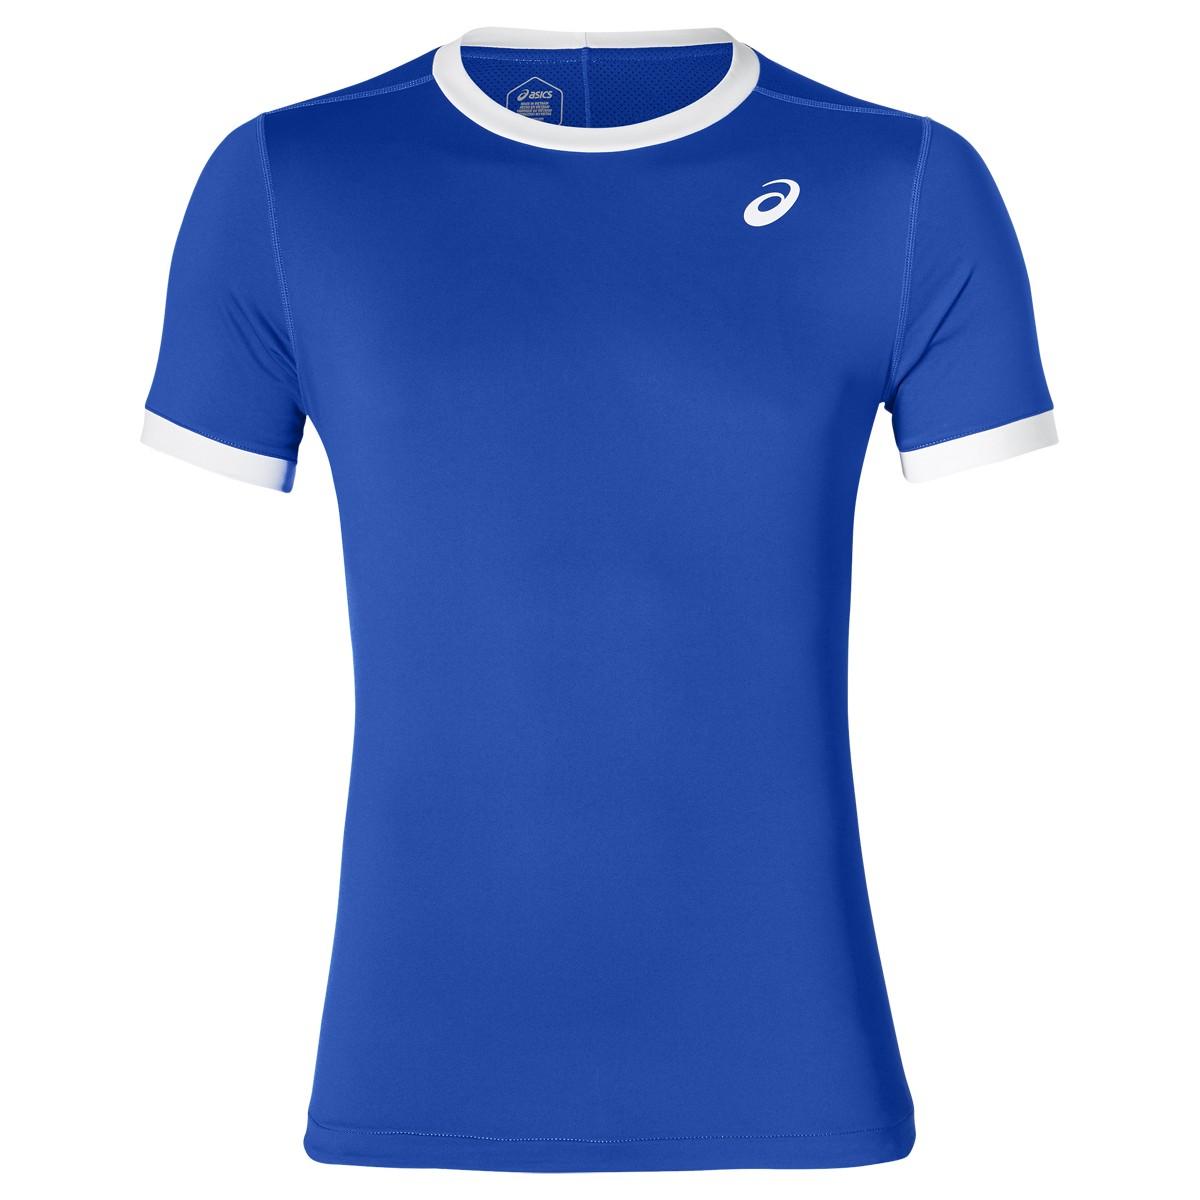 ASICS CLUB T-SHIRT - ASICS - Men's - Clothing | Tennispro